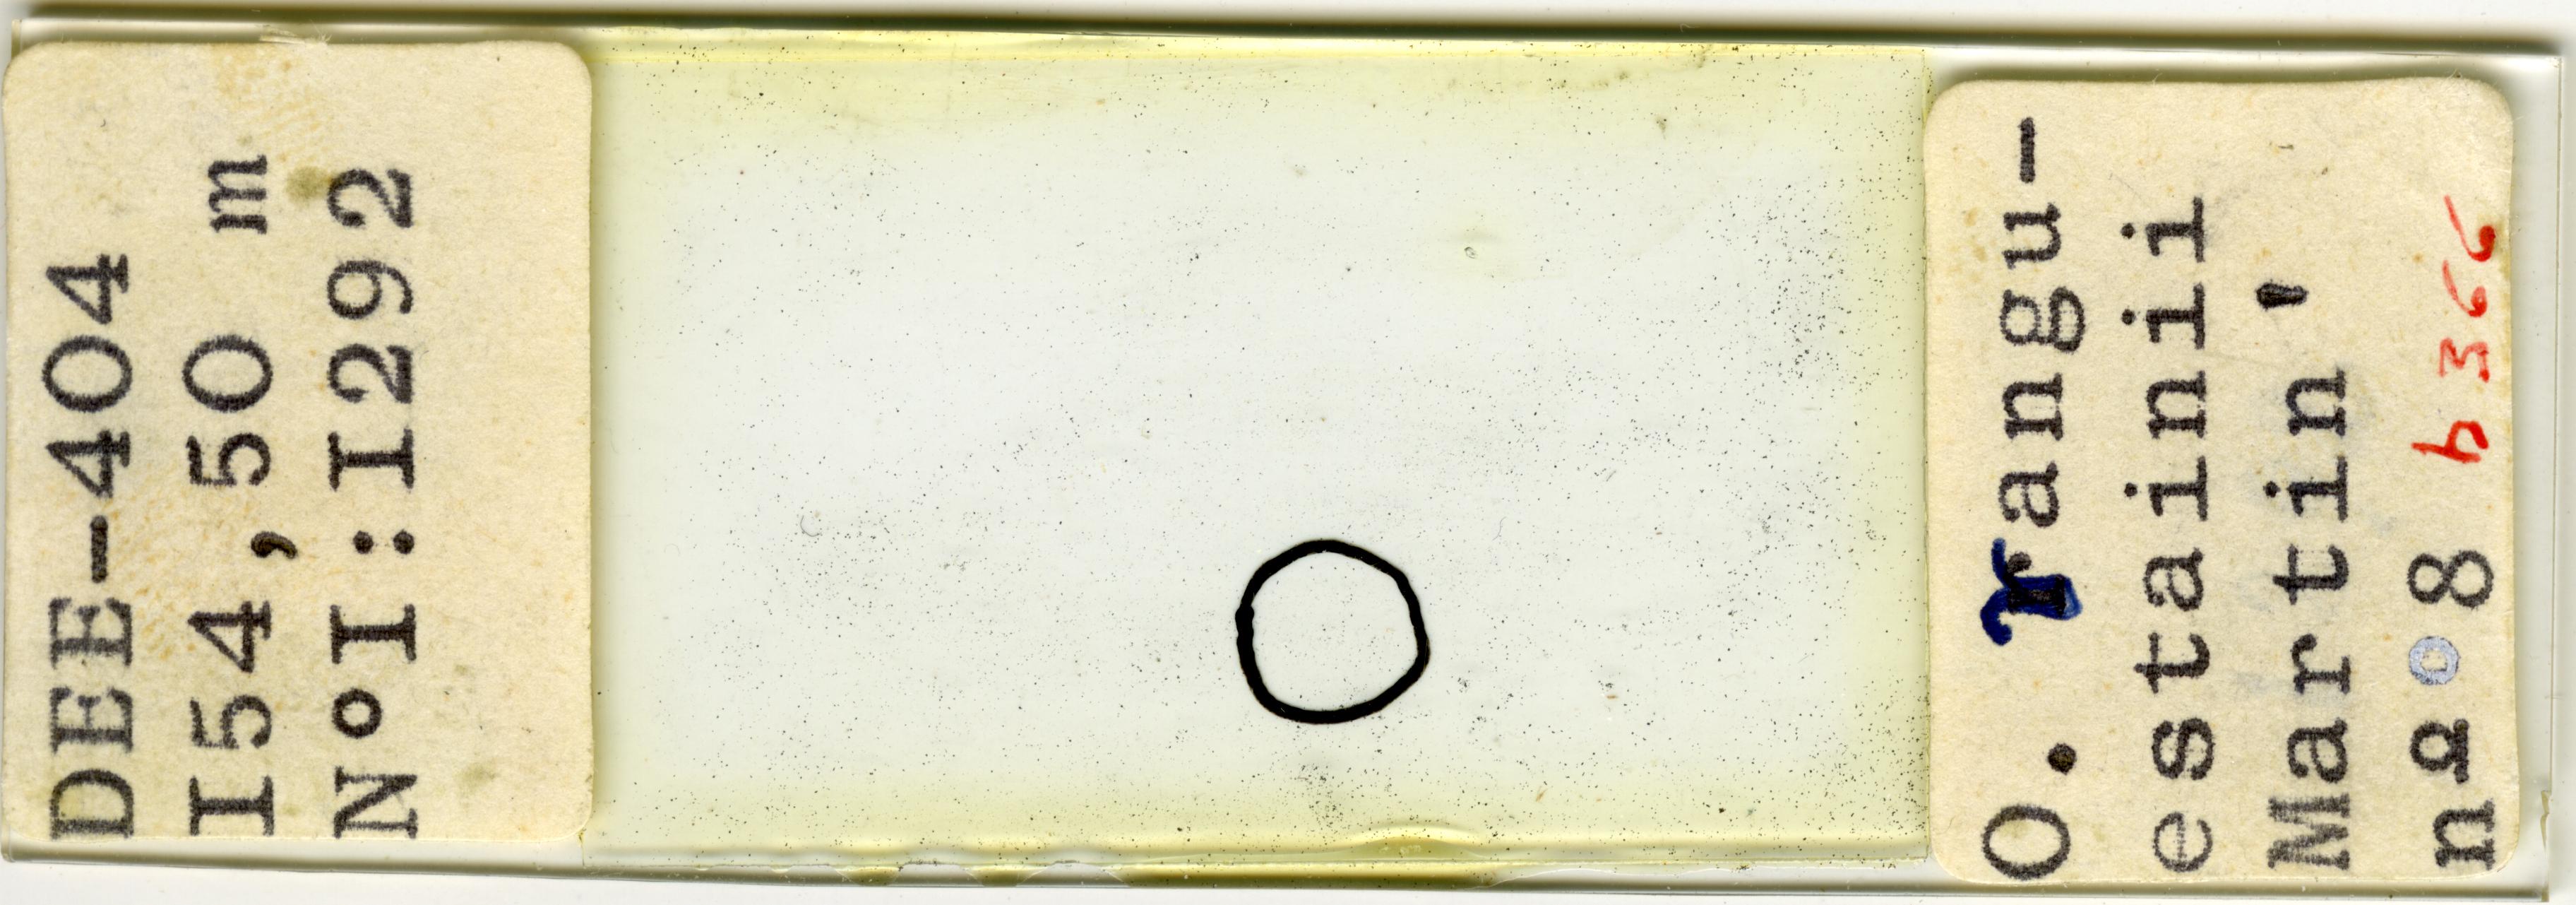 Lame n°DEE-404 I54, 50 m N° I : I292 - O. vanguestaini Martin ' n° 8 b 366